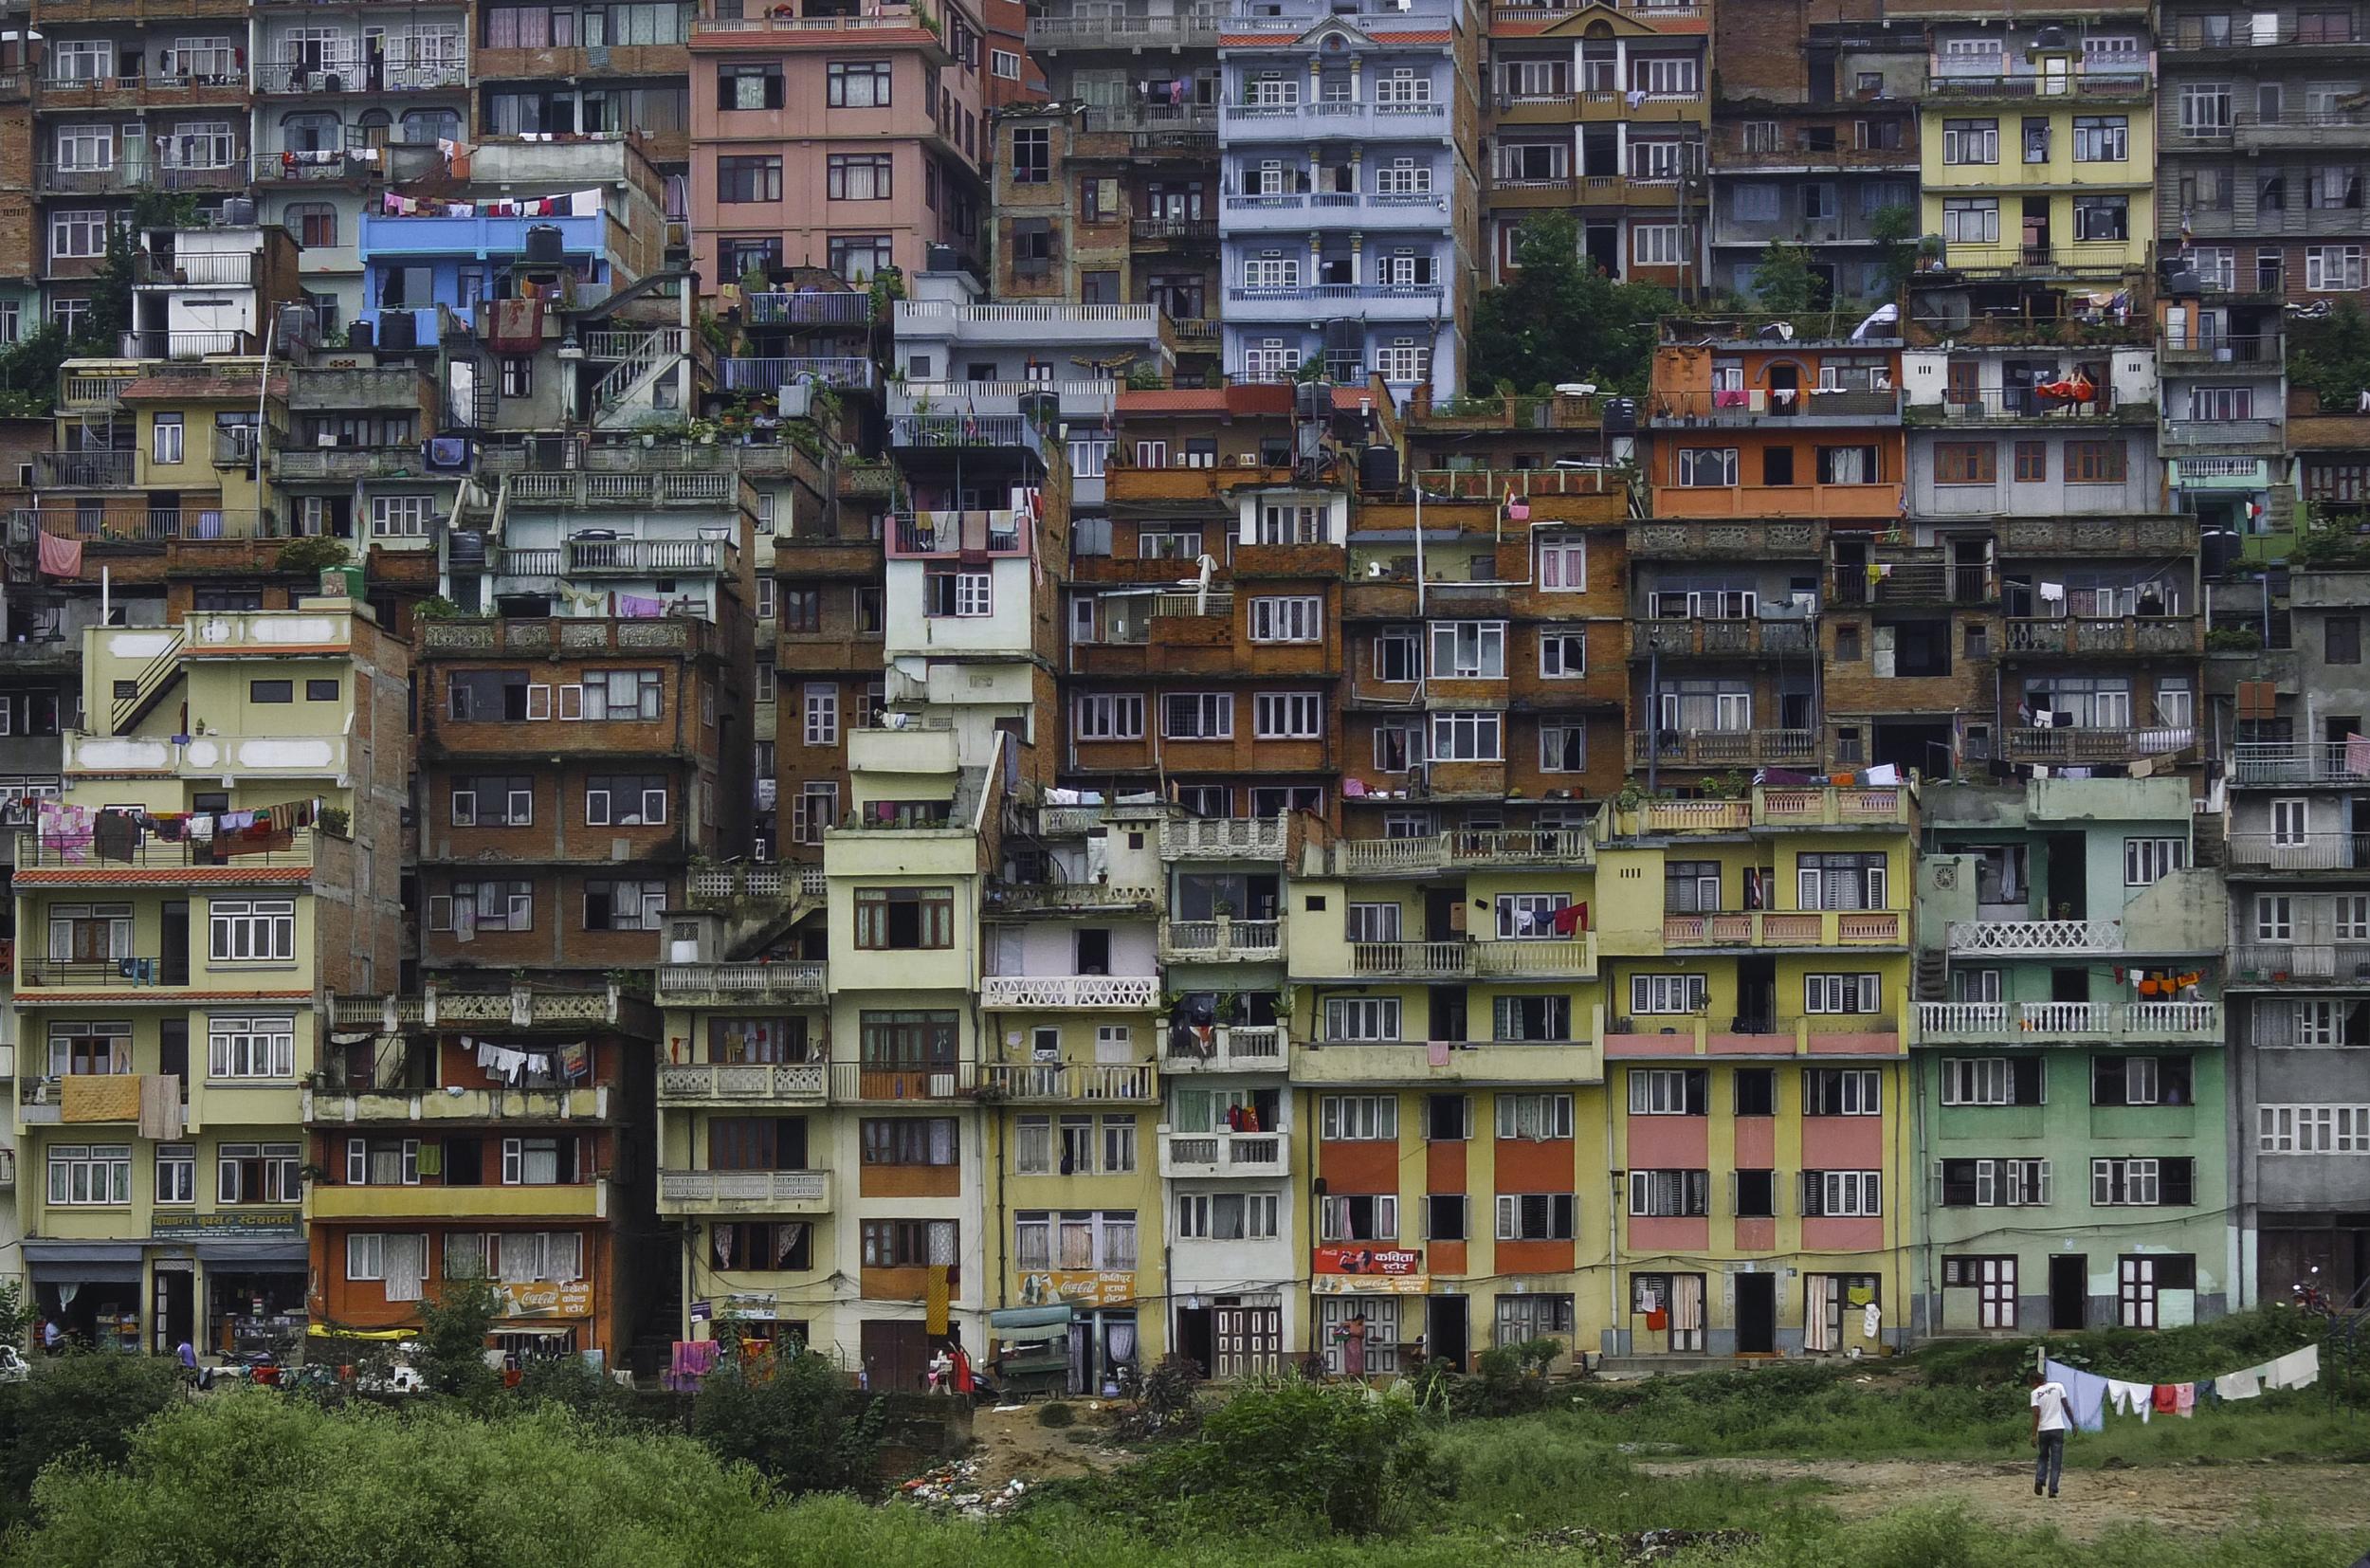 Nepal Kirtipur Color iiiii (1 of 1).jpg